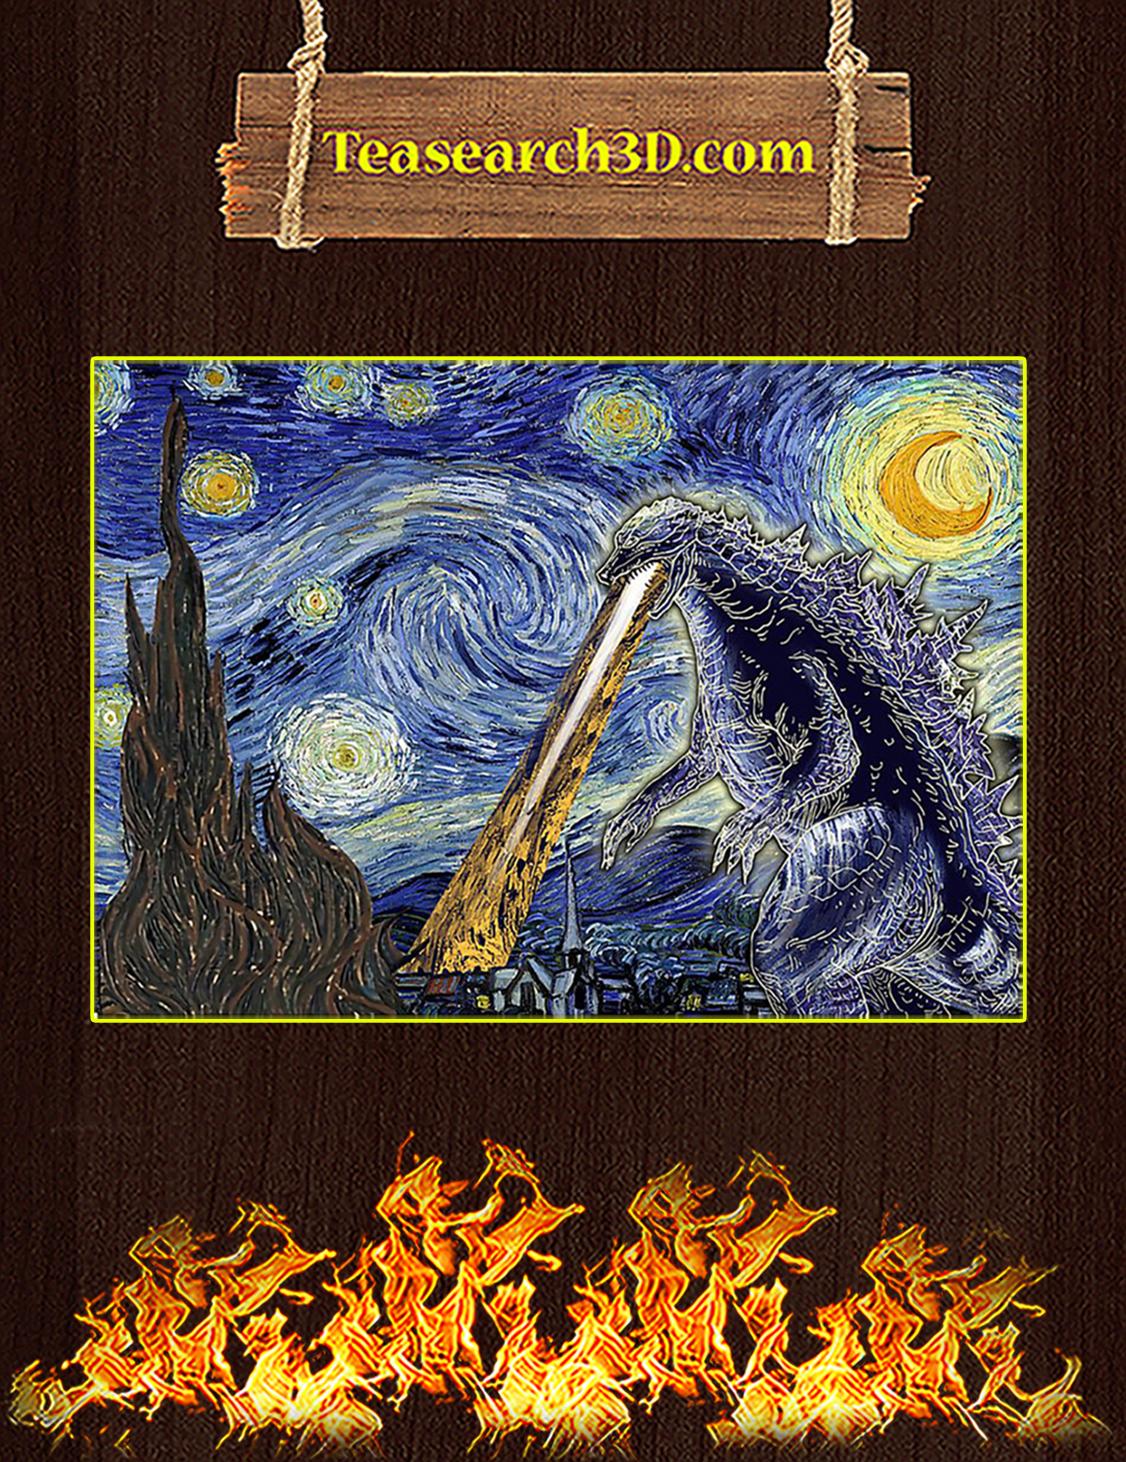 Van gogh starry night godzilla poster A3